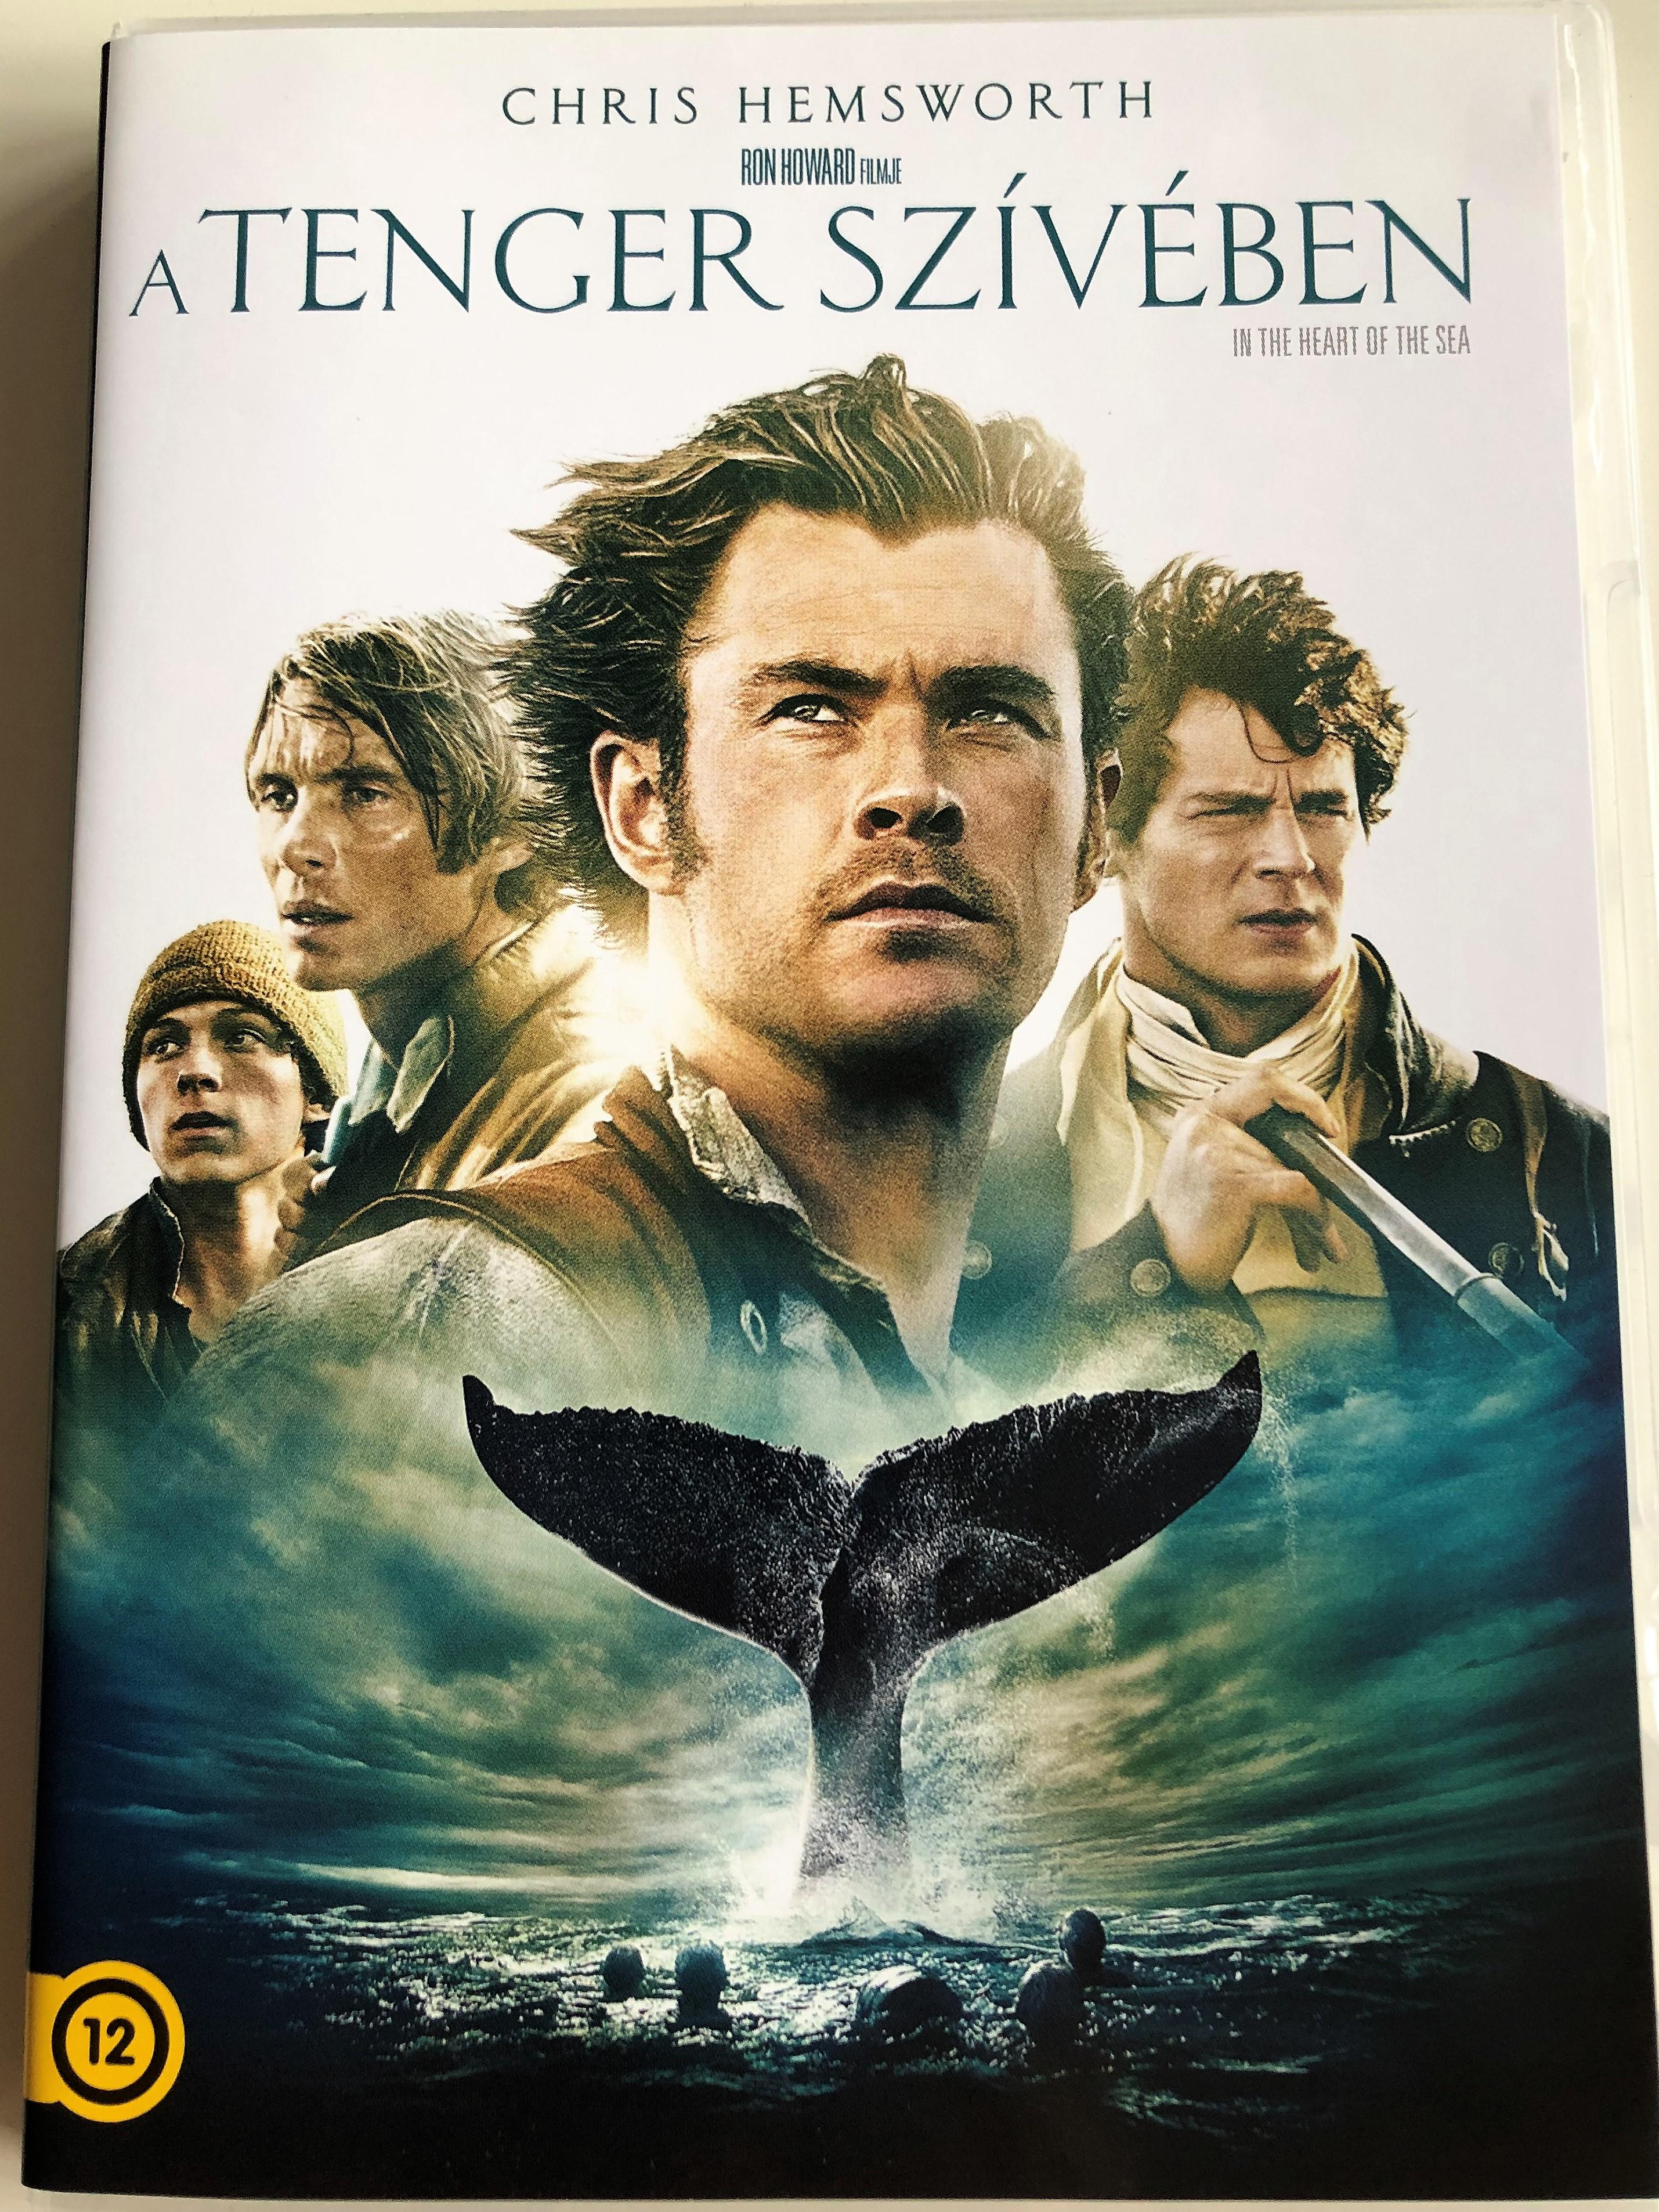 in-the-heart-of-the-sea-dvd-2015-a-tenger-sz-v-ben-directed-by-ron-howard-starring-chris-hemsworth-benjamin-walker-cillian-murphy-tom-holland-ben-whishaw-brendan-gleeson-1-.jpg